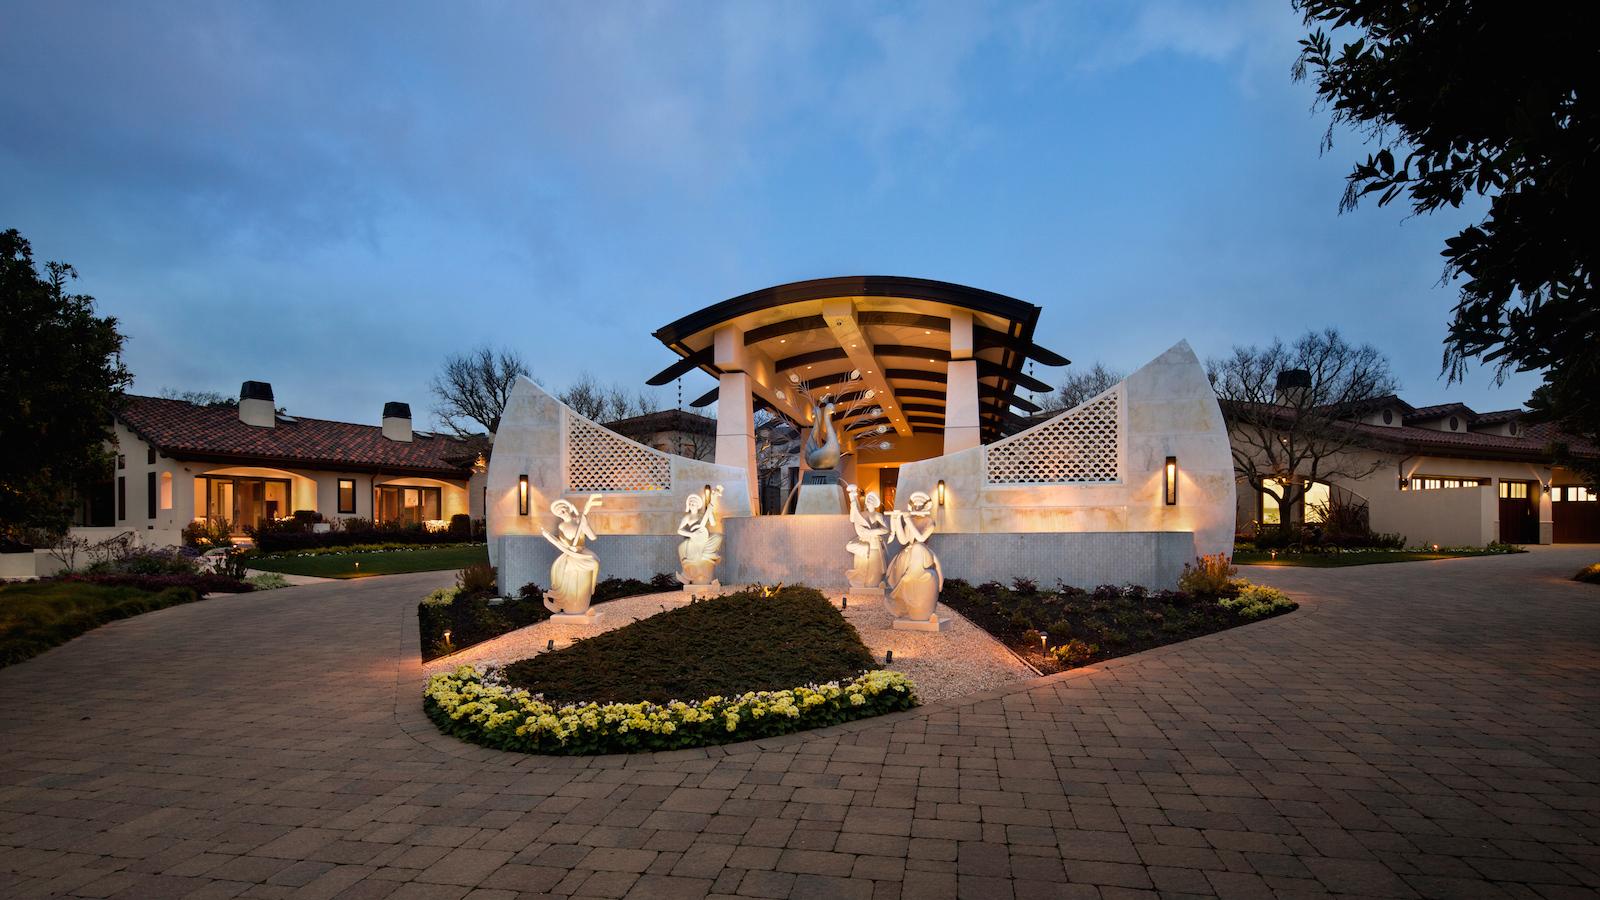 Kumar Malavalli is seeking $88 million for his Los Altos Hills, California estate.